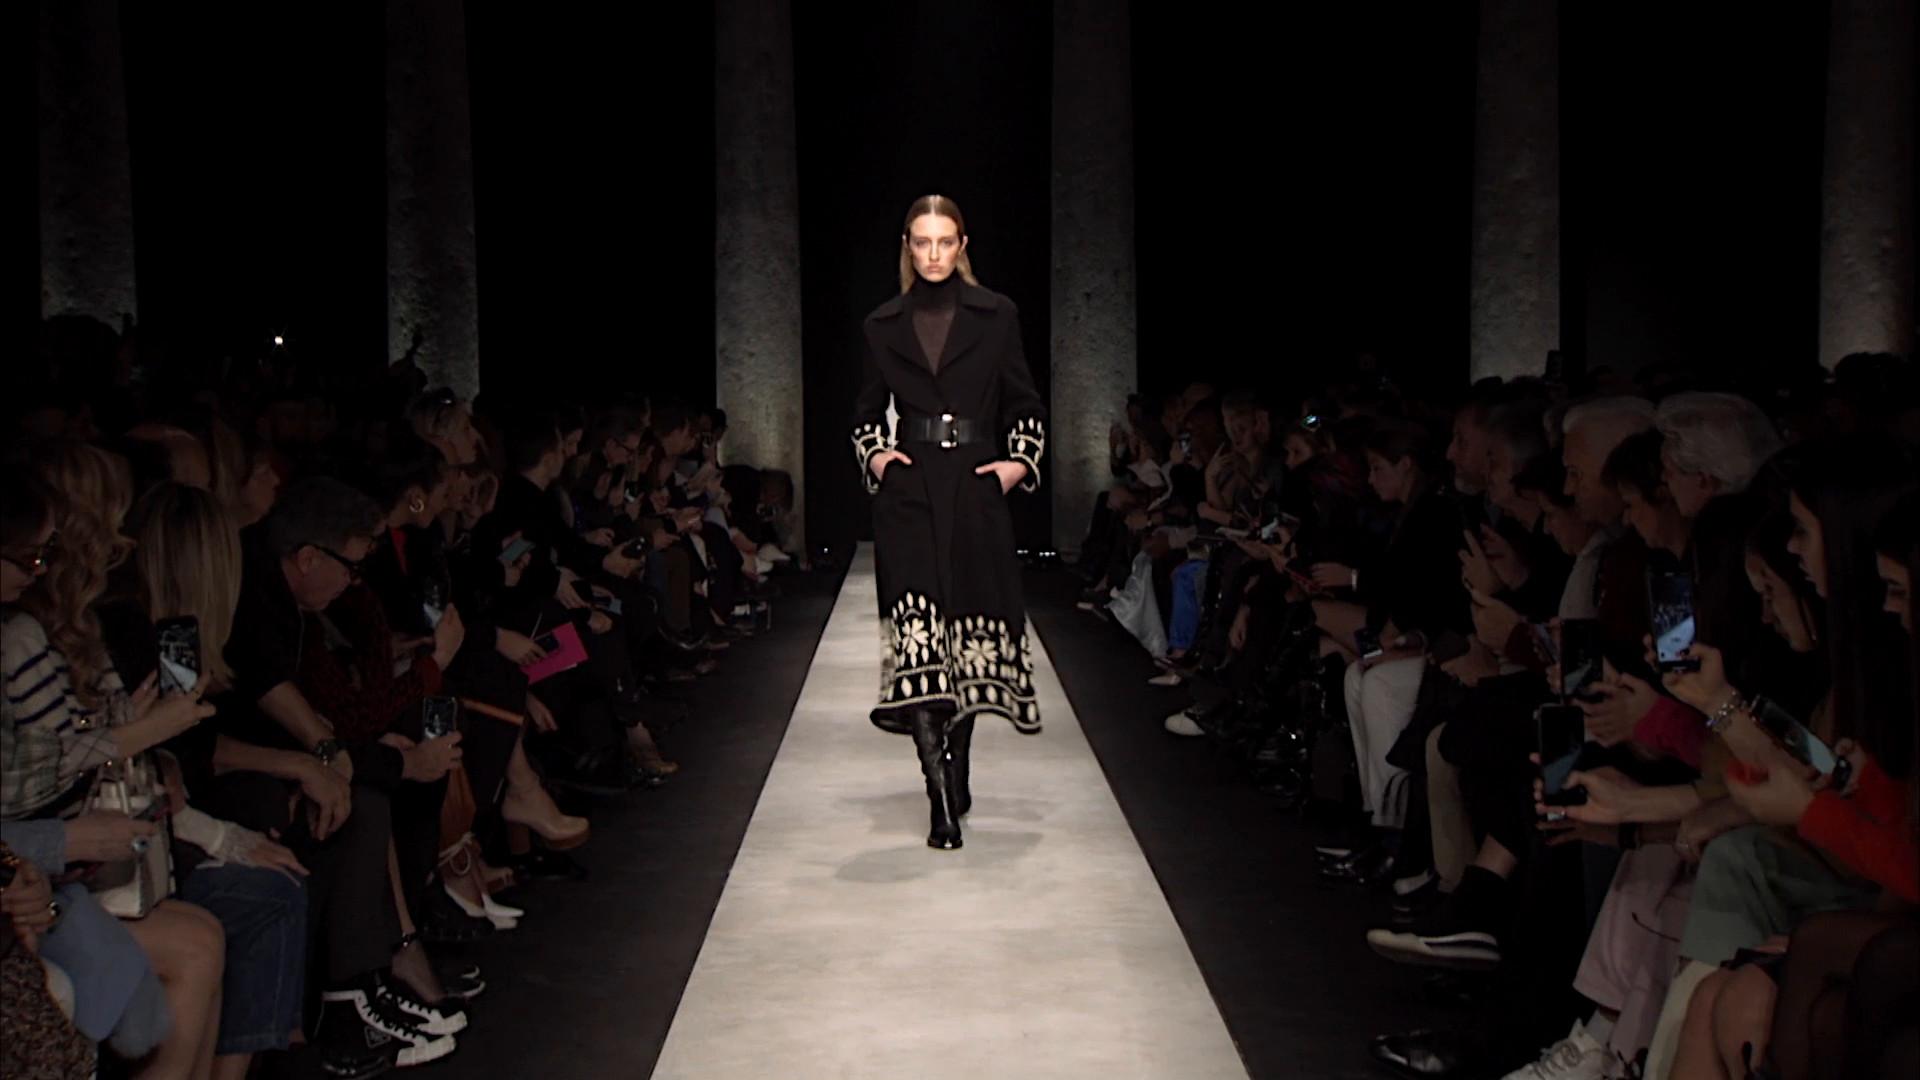 Ermanno Scervino Fall Winter 2020 Fashion Show - Milan Fashion Week